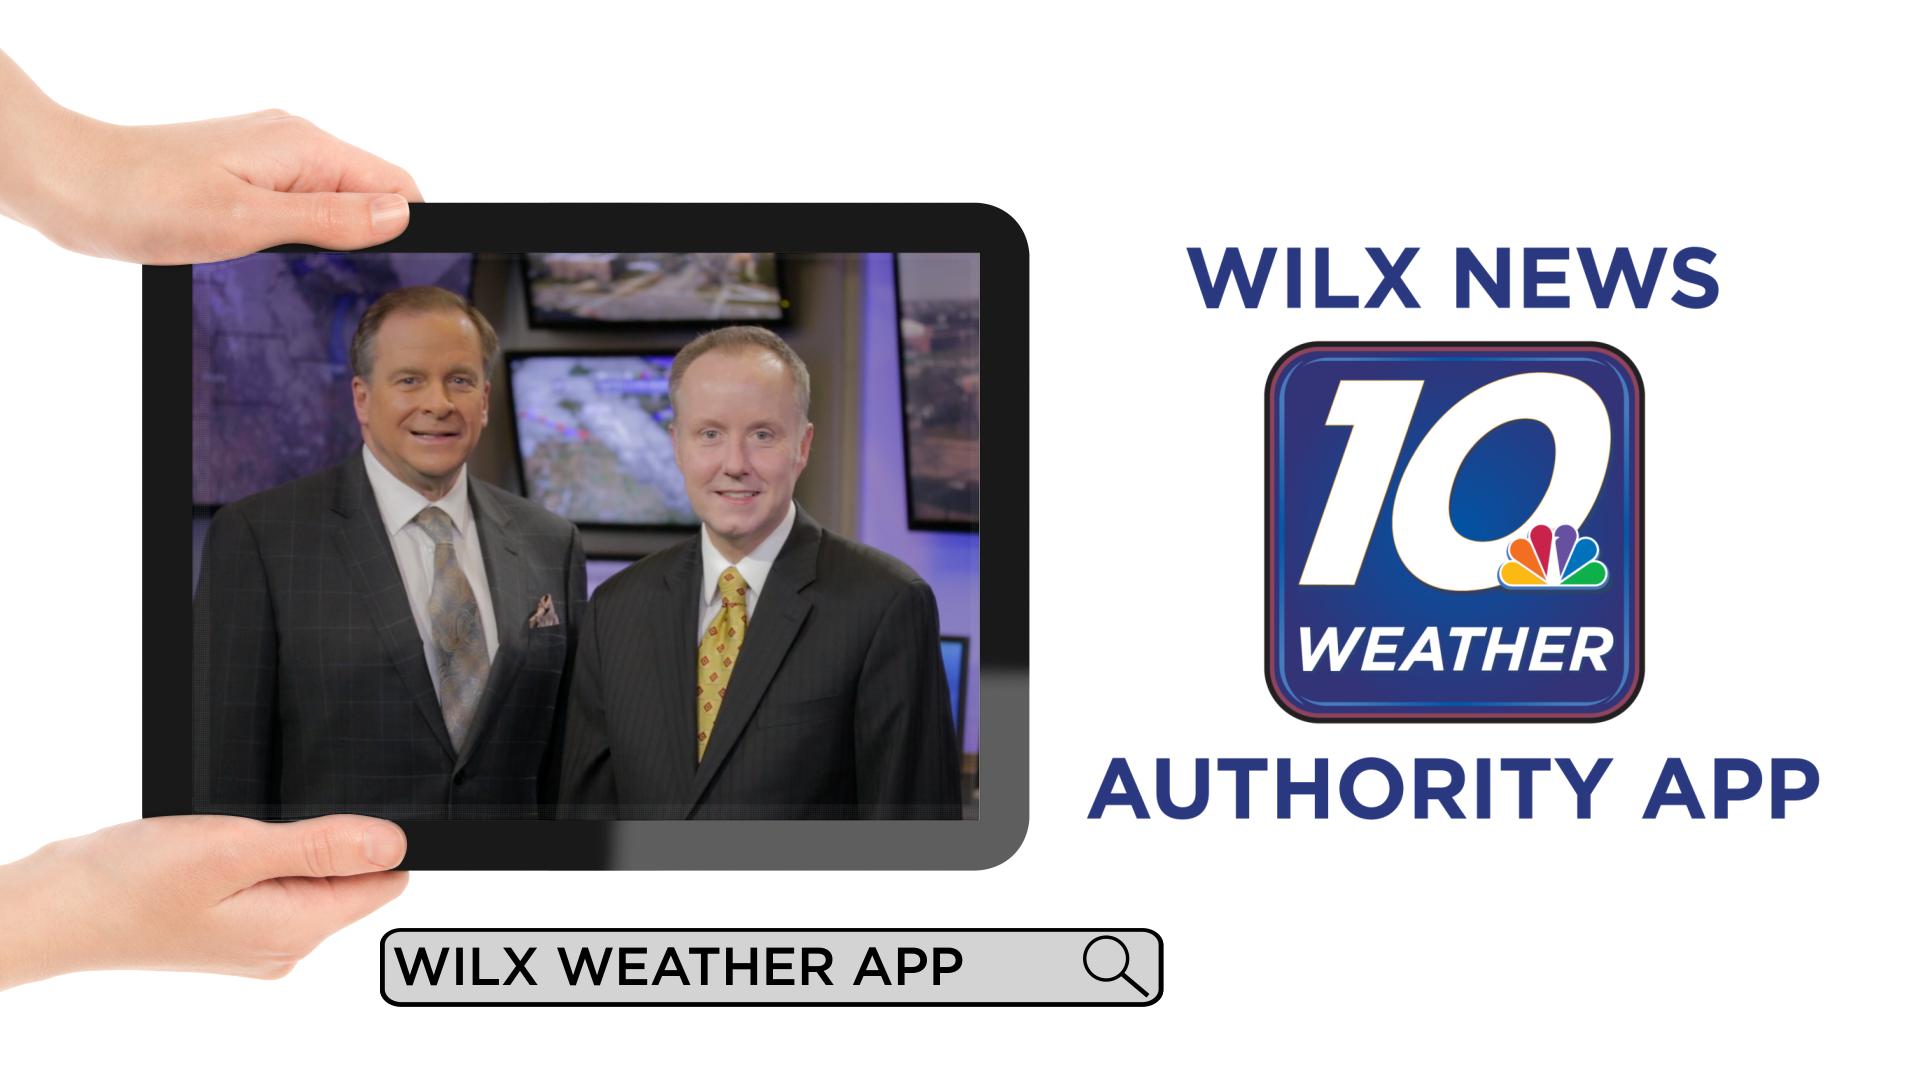 WILX Weather App Winner